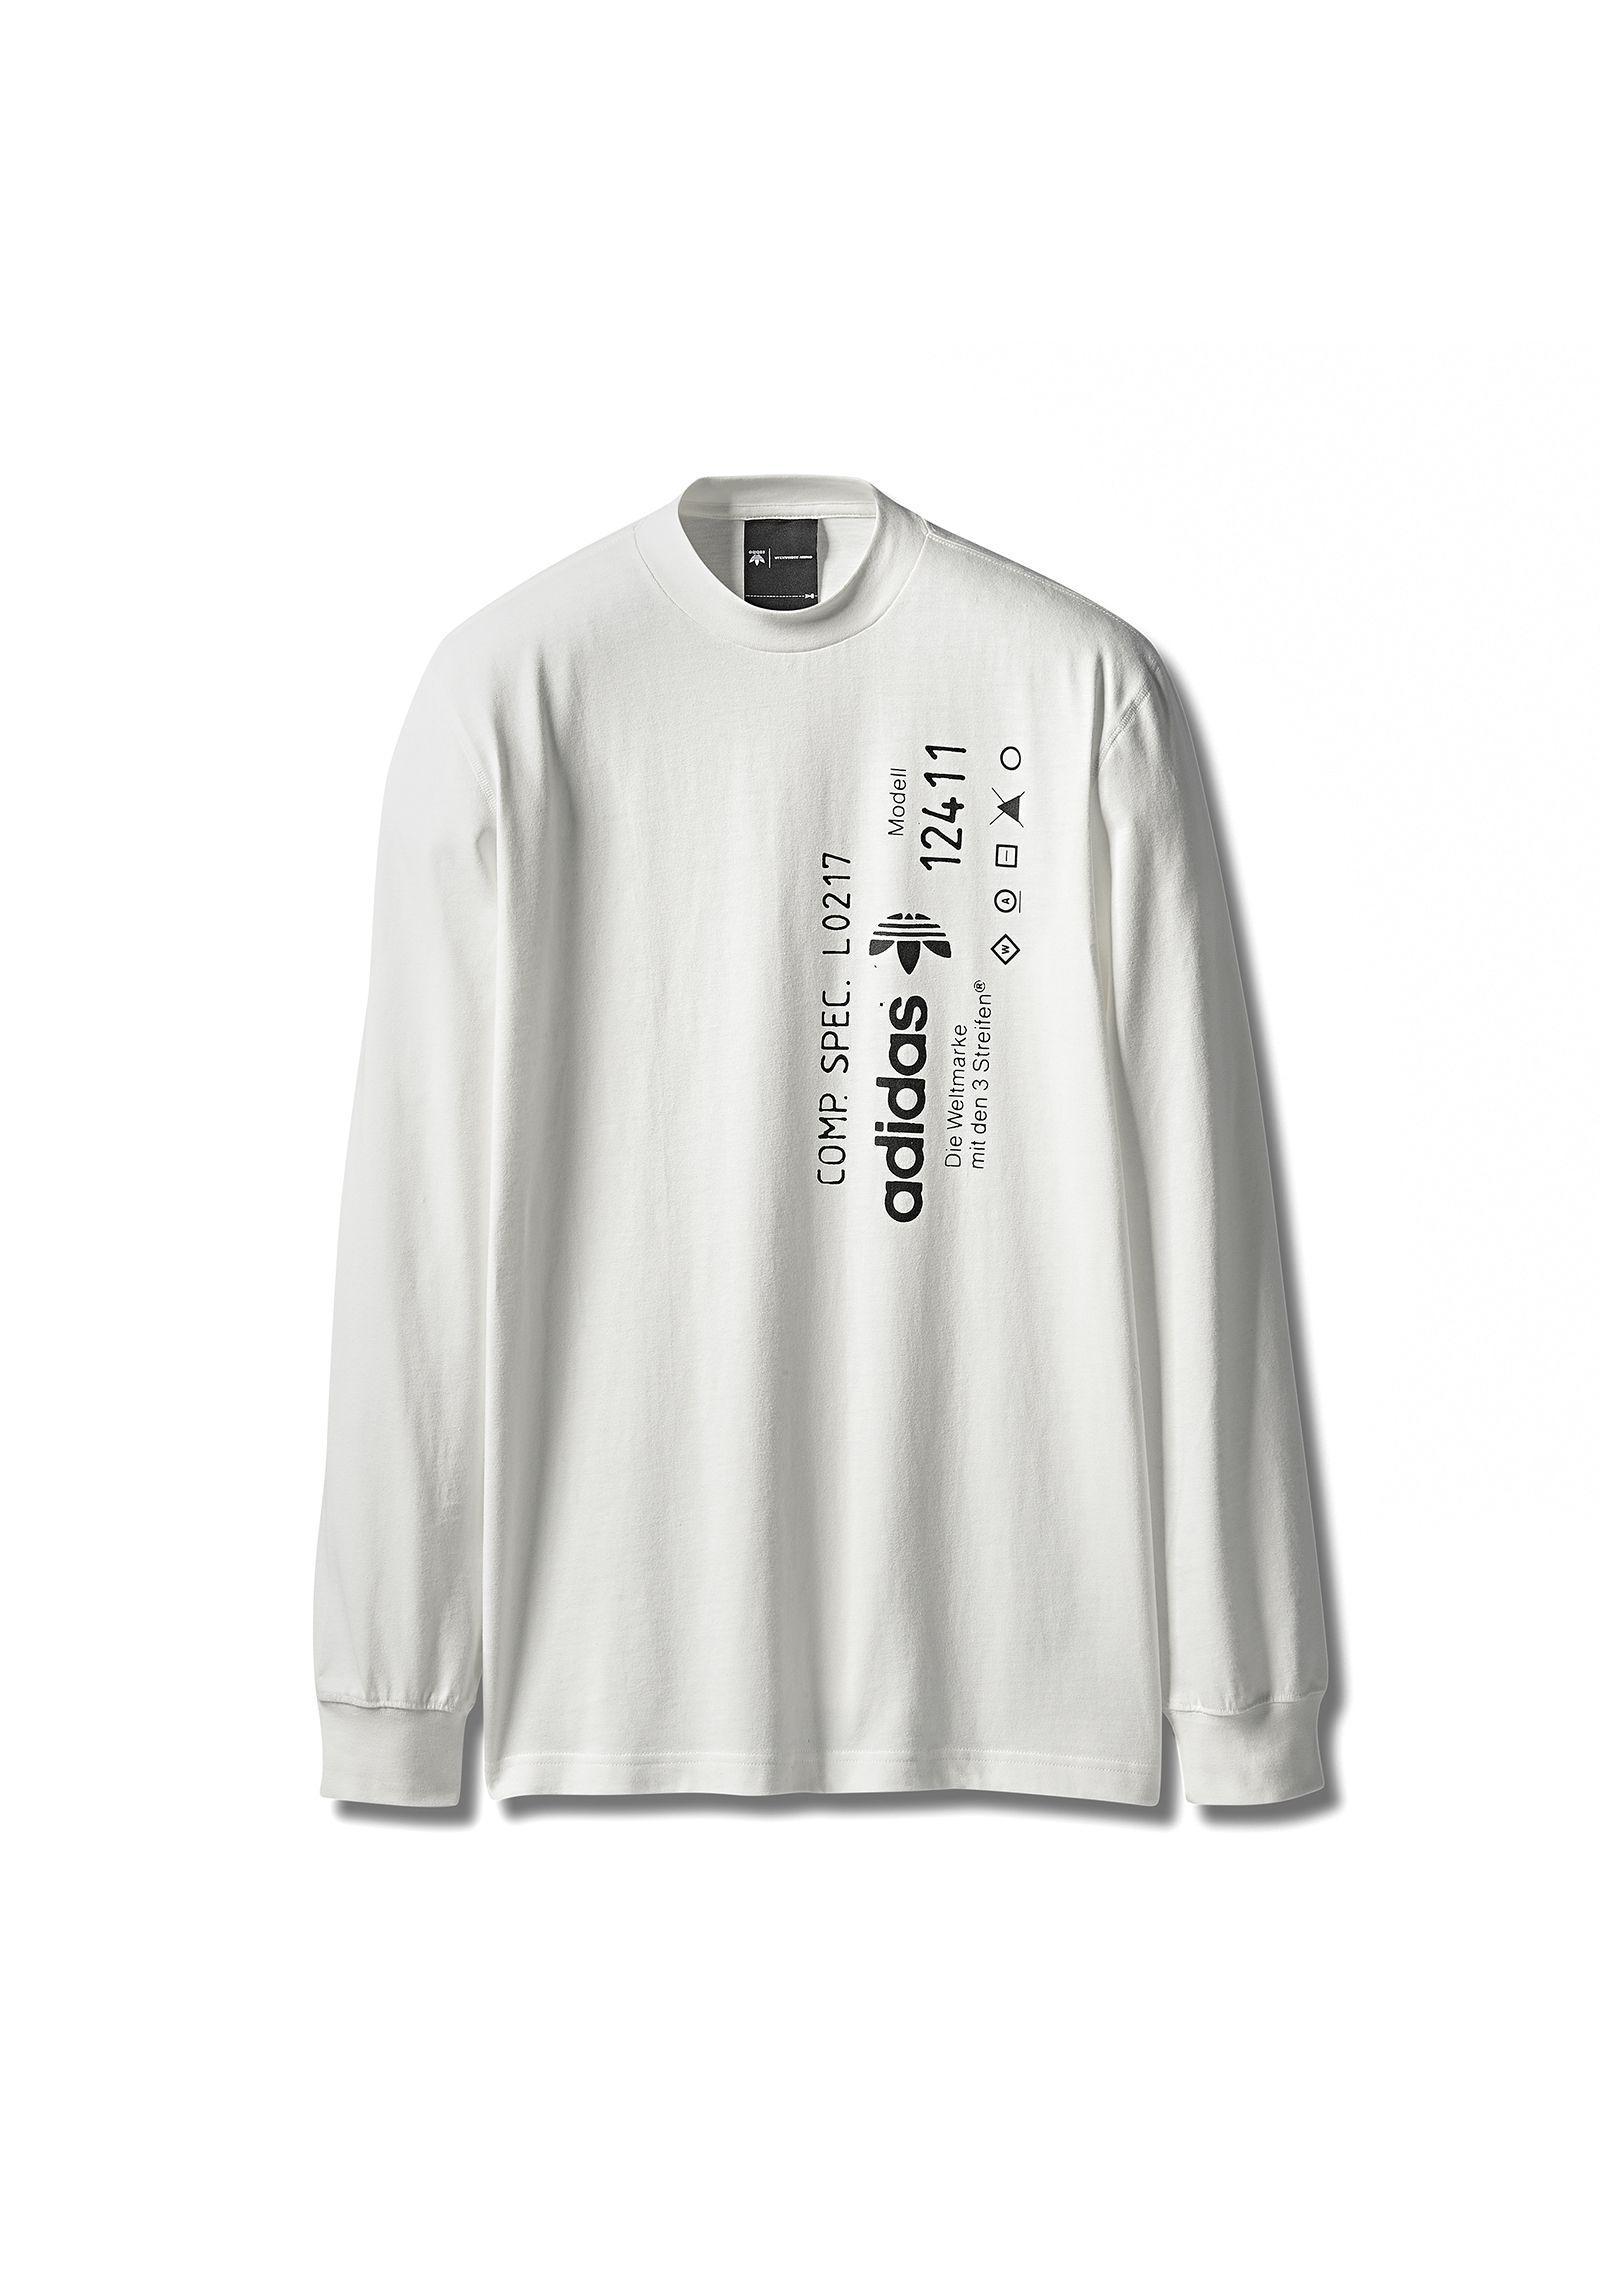 3d18da11cd0b Alexander Wang Adidas Originals By Aw Graphic Long Sleeve in White ...